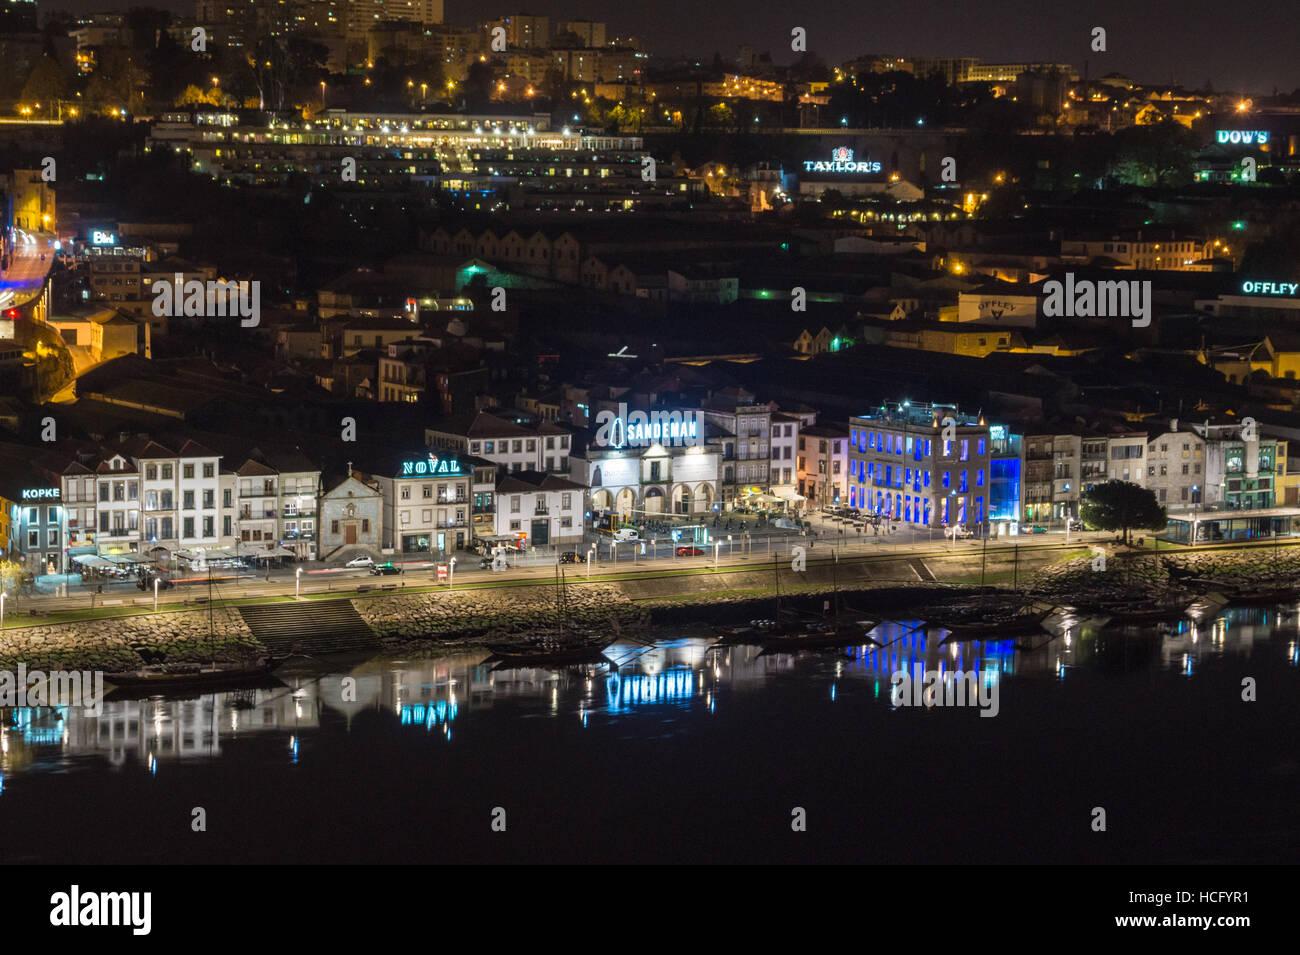 Port lodges, Vila Nova de Gaia, River Douro, Porto, Portugal, at dusk seen from the Ribeira Stock Photo